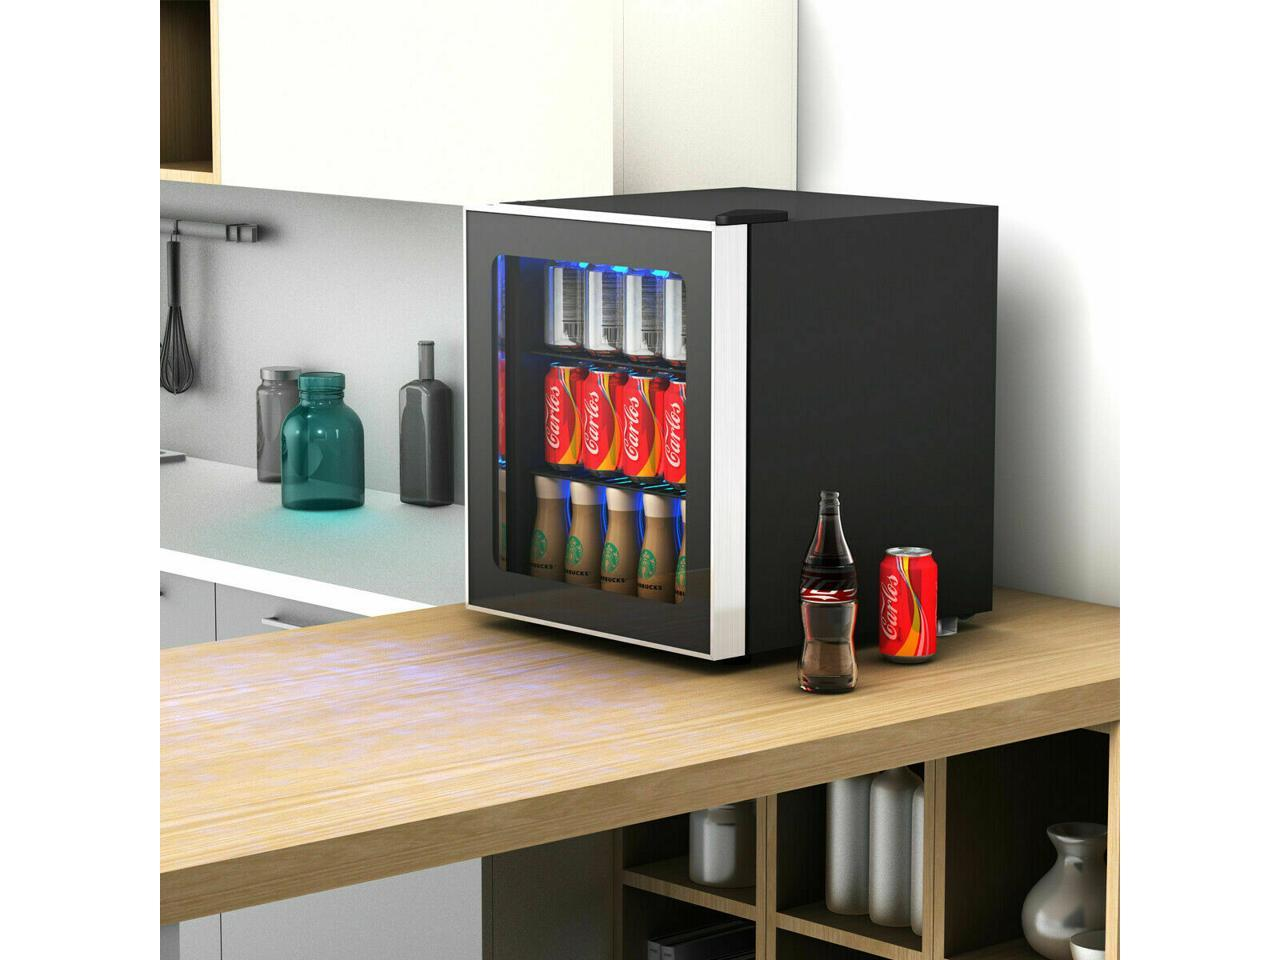 Portable Refrigeration Rapid Cup Cooler Wine Beverage Electronic Bottle Chiller Desktop Fast Cooling Fridge Single Bottle Drink Smart Touch Control Heating and cooling 2 in 1